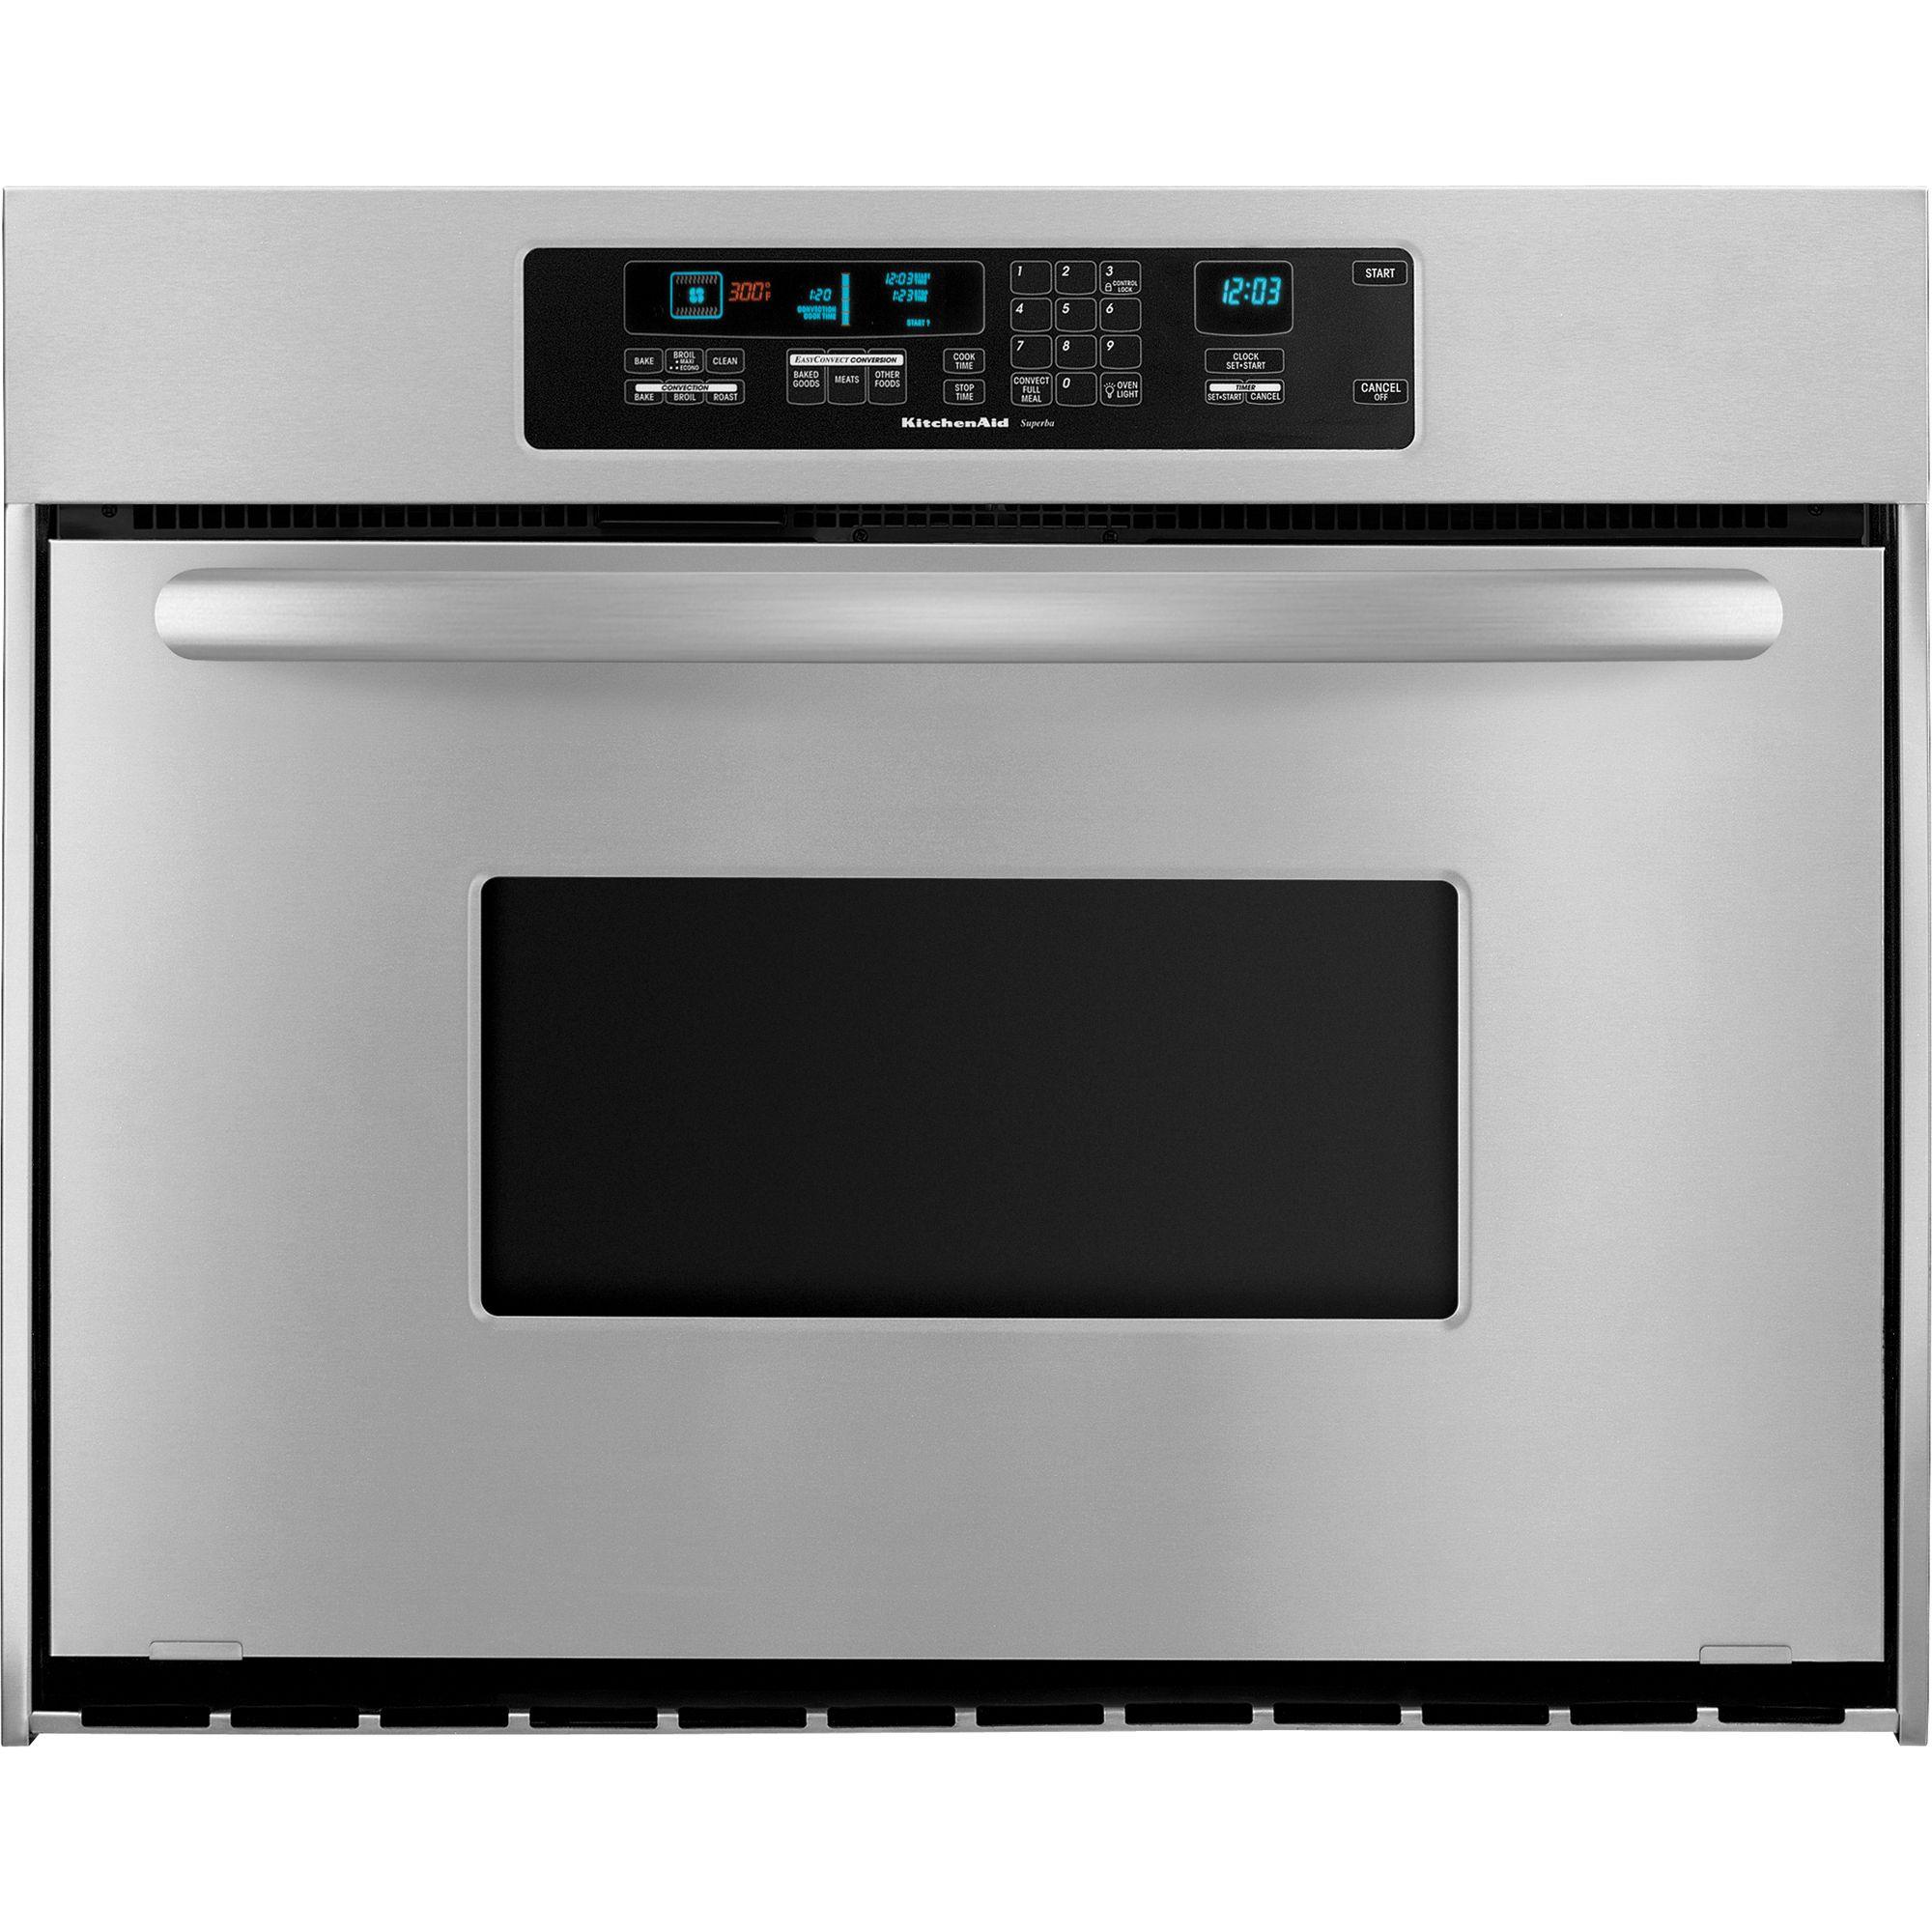 "Oven Baking Element >> KitchenAid KEBC167VSS Architect® 36"" Single Wall Oven w/ True Convection"